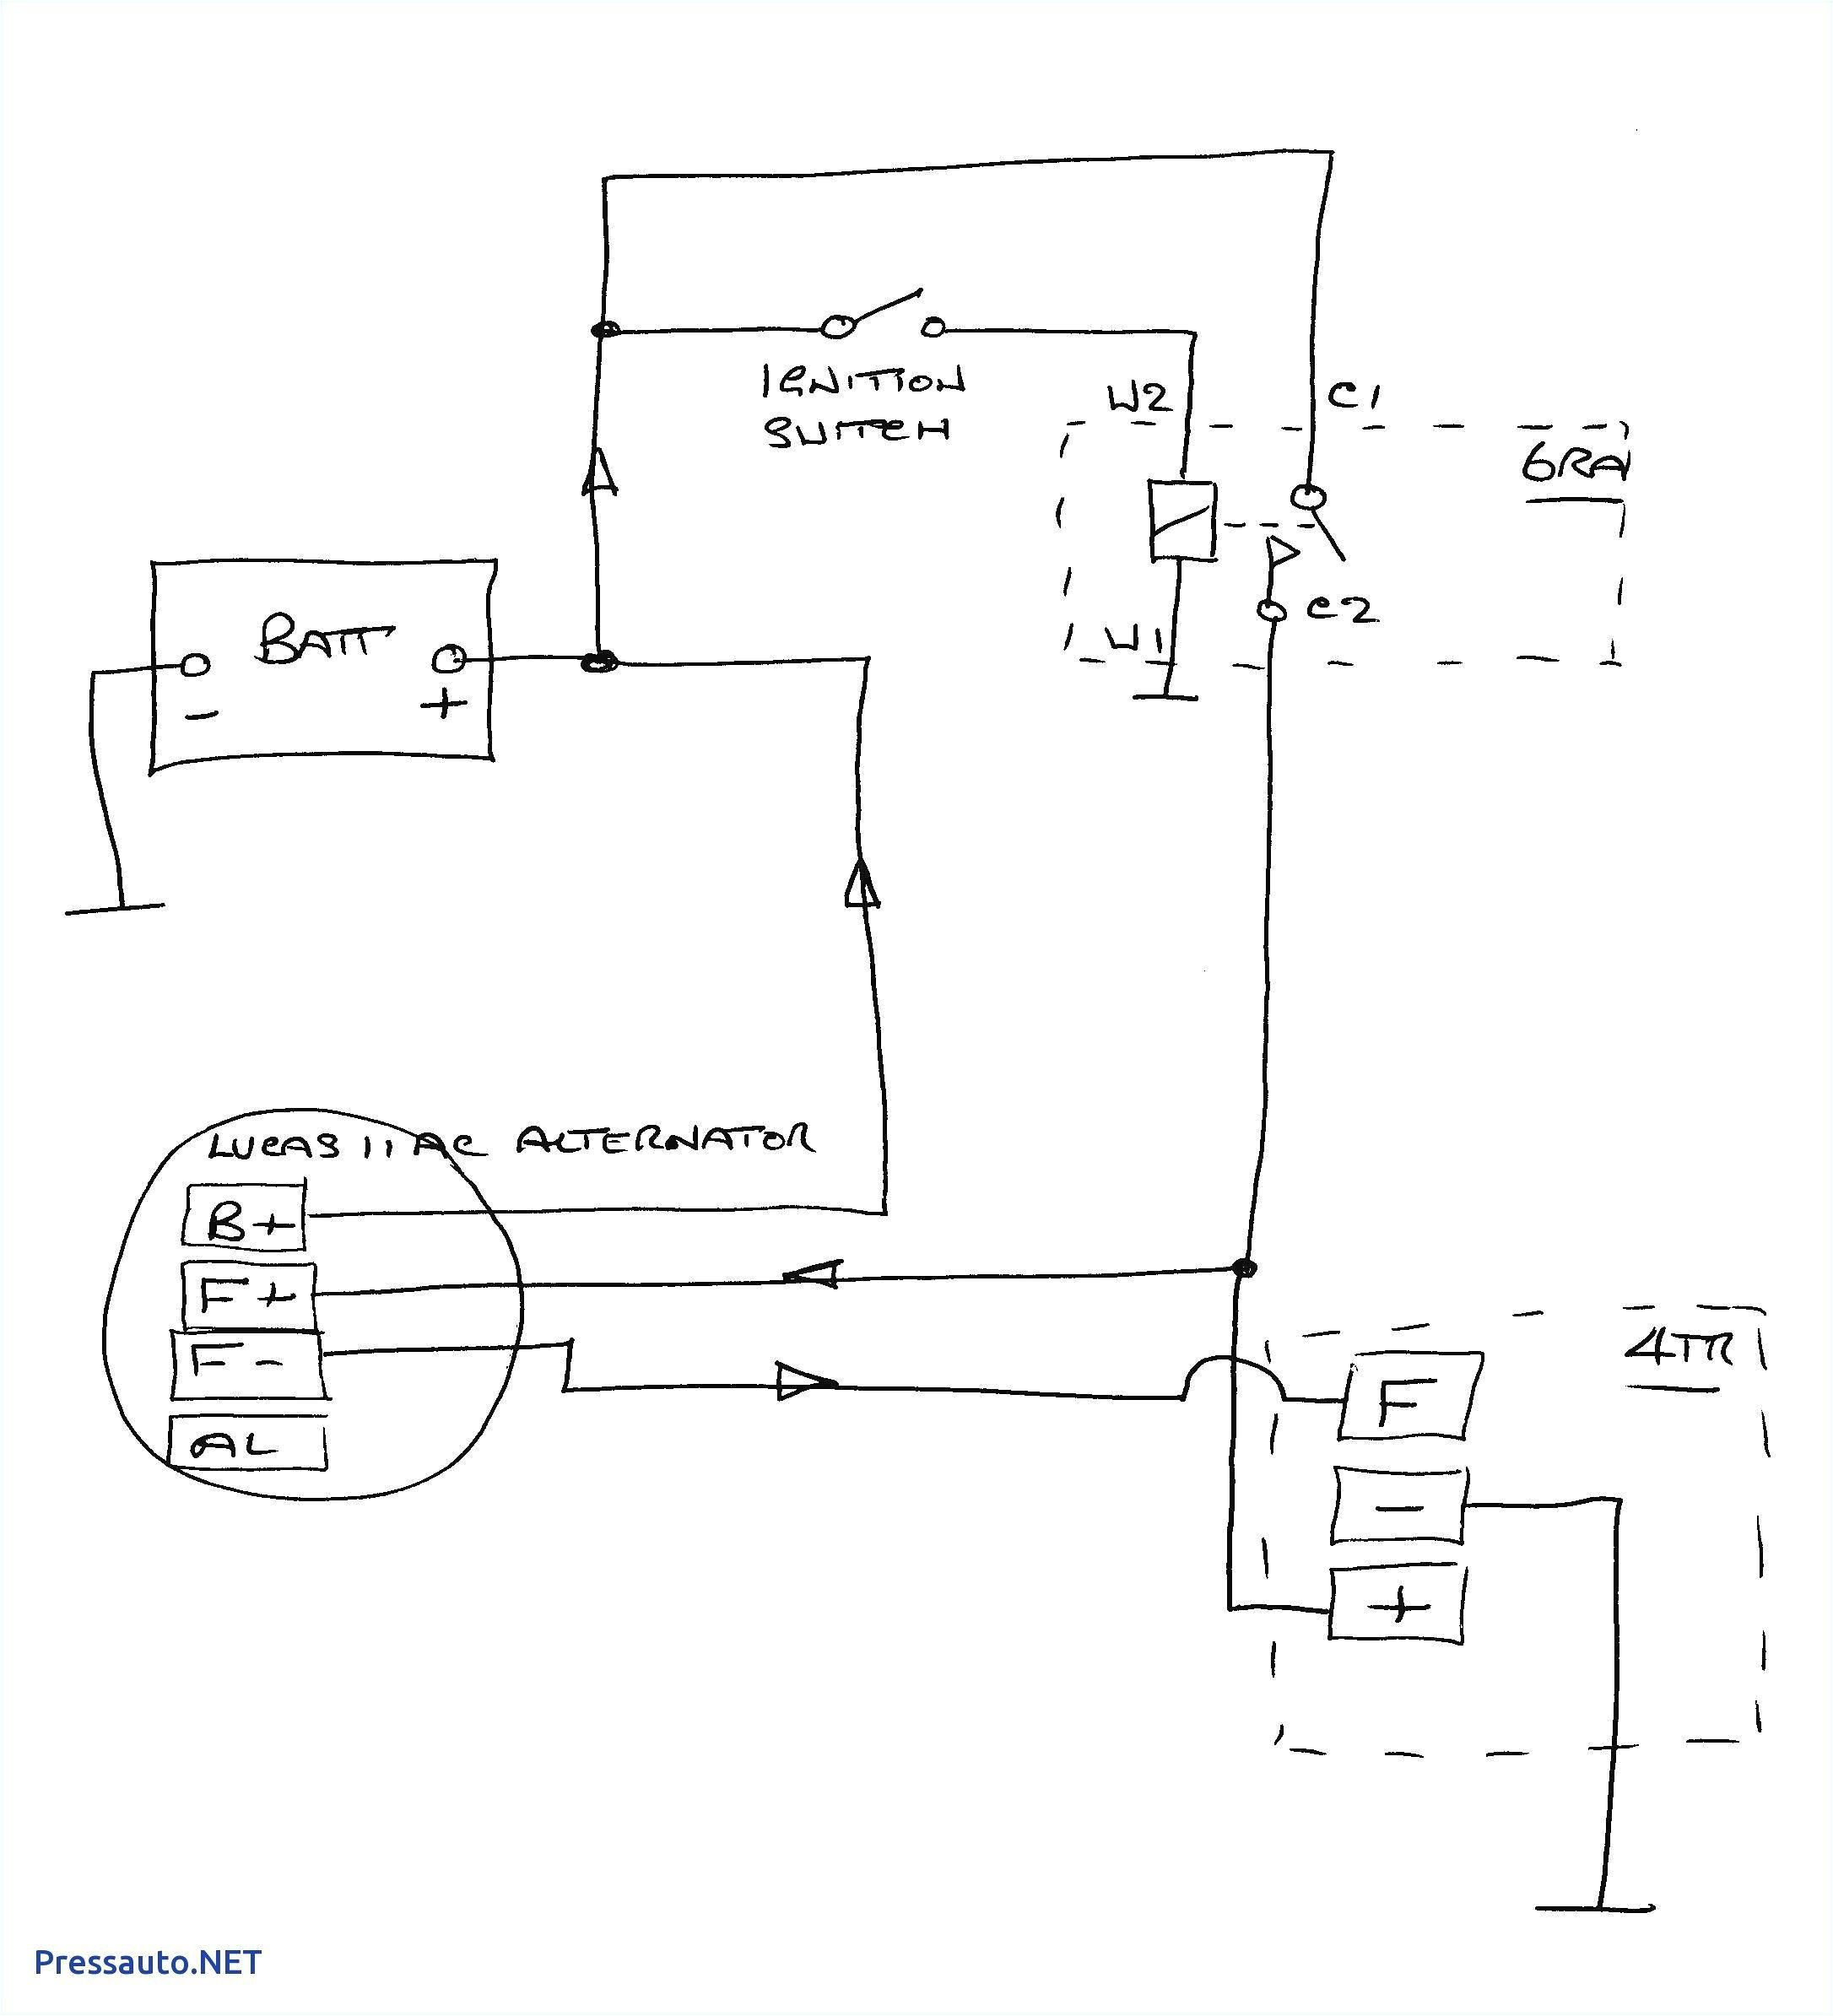 gm si alternator wiring diagram gm alternator wiring diagram 4 wire luxury delco remy alternator jpg